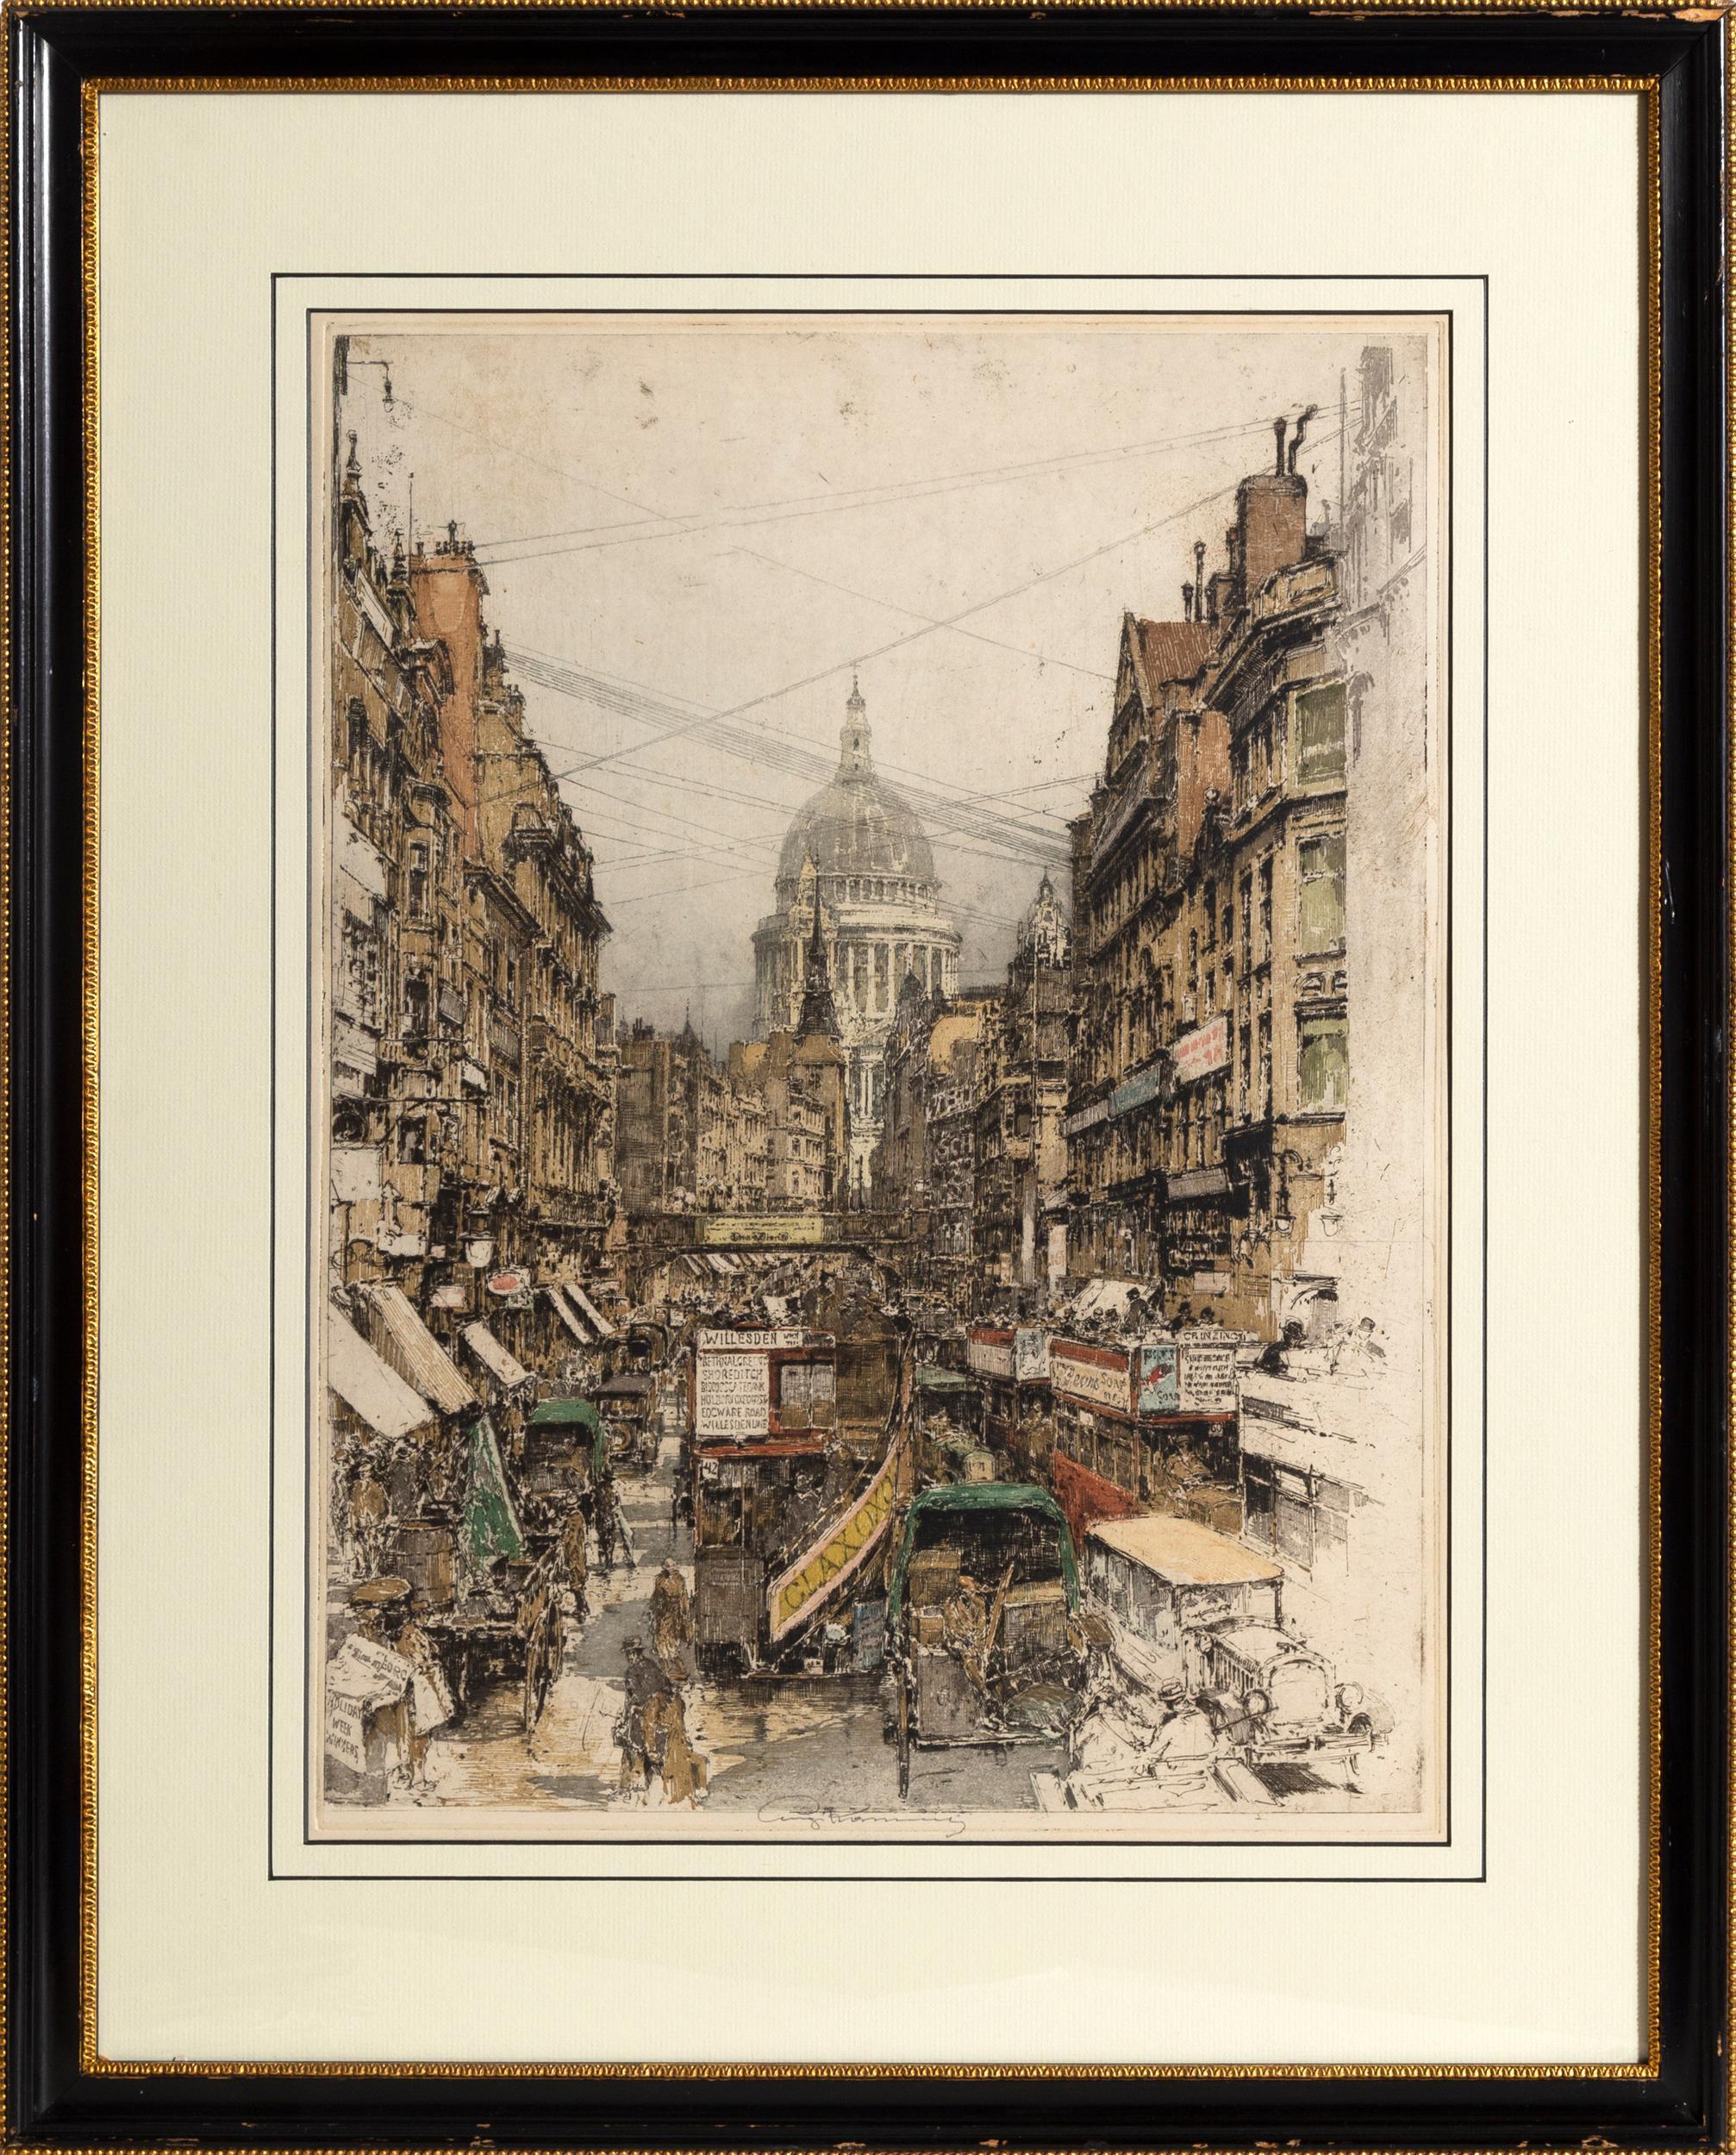 Luigi Kasimir, Fleet Street, Aquatint Etching